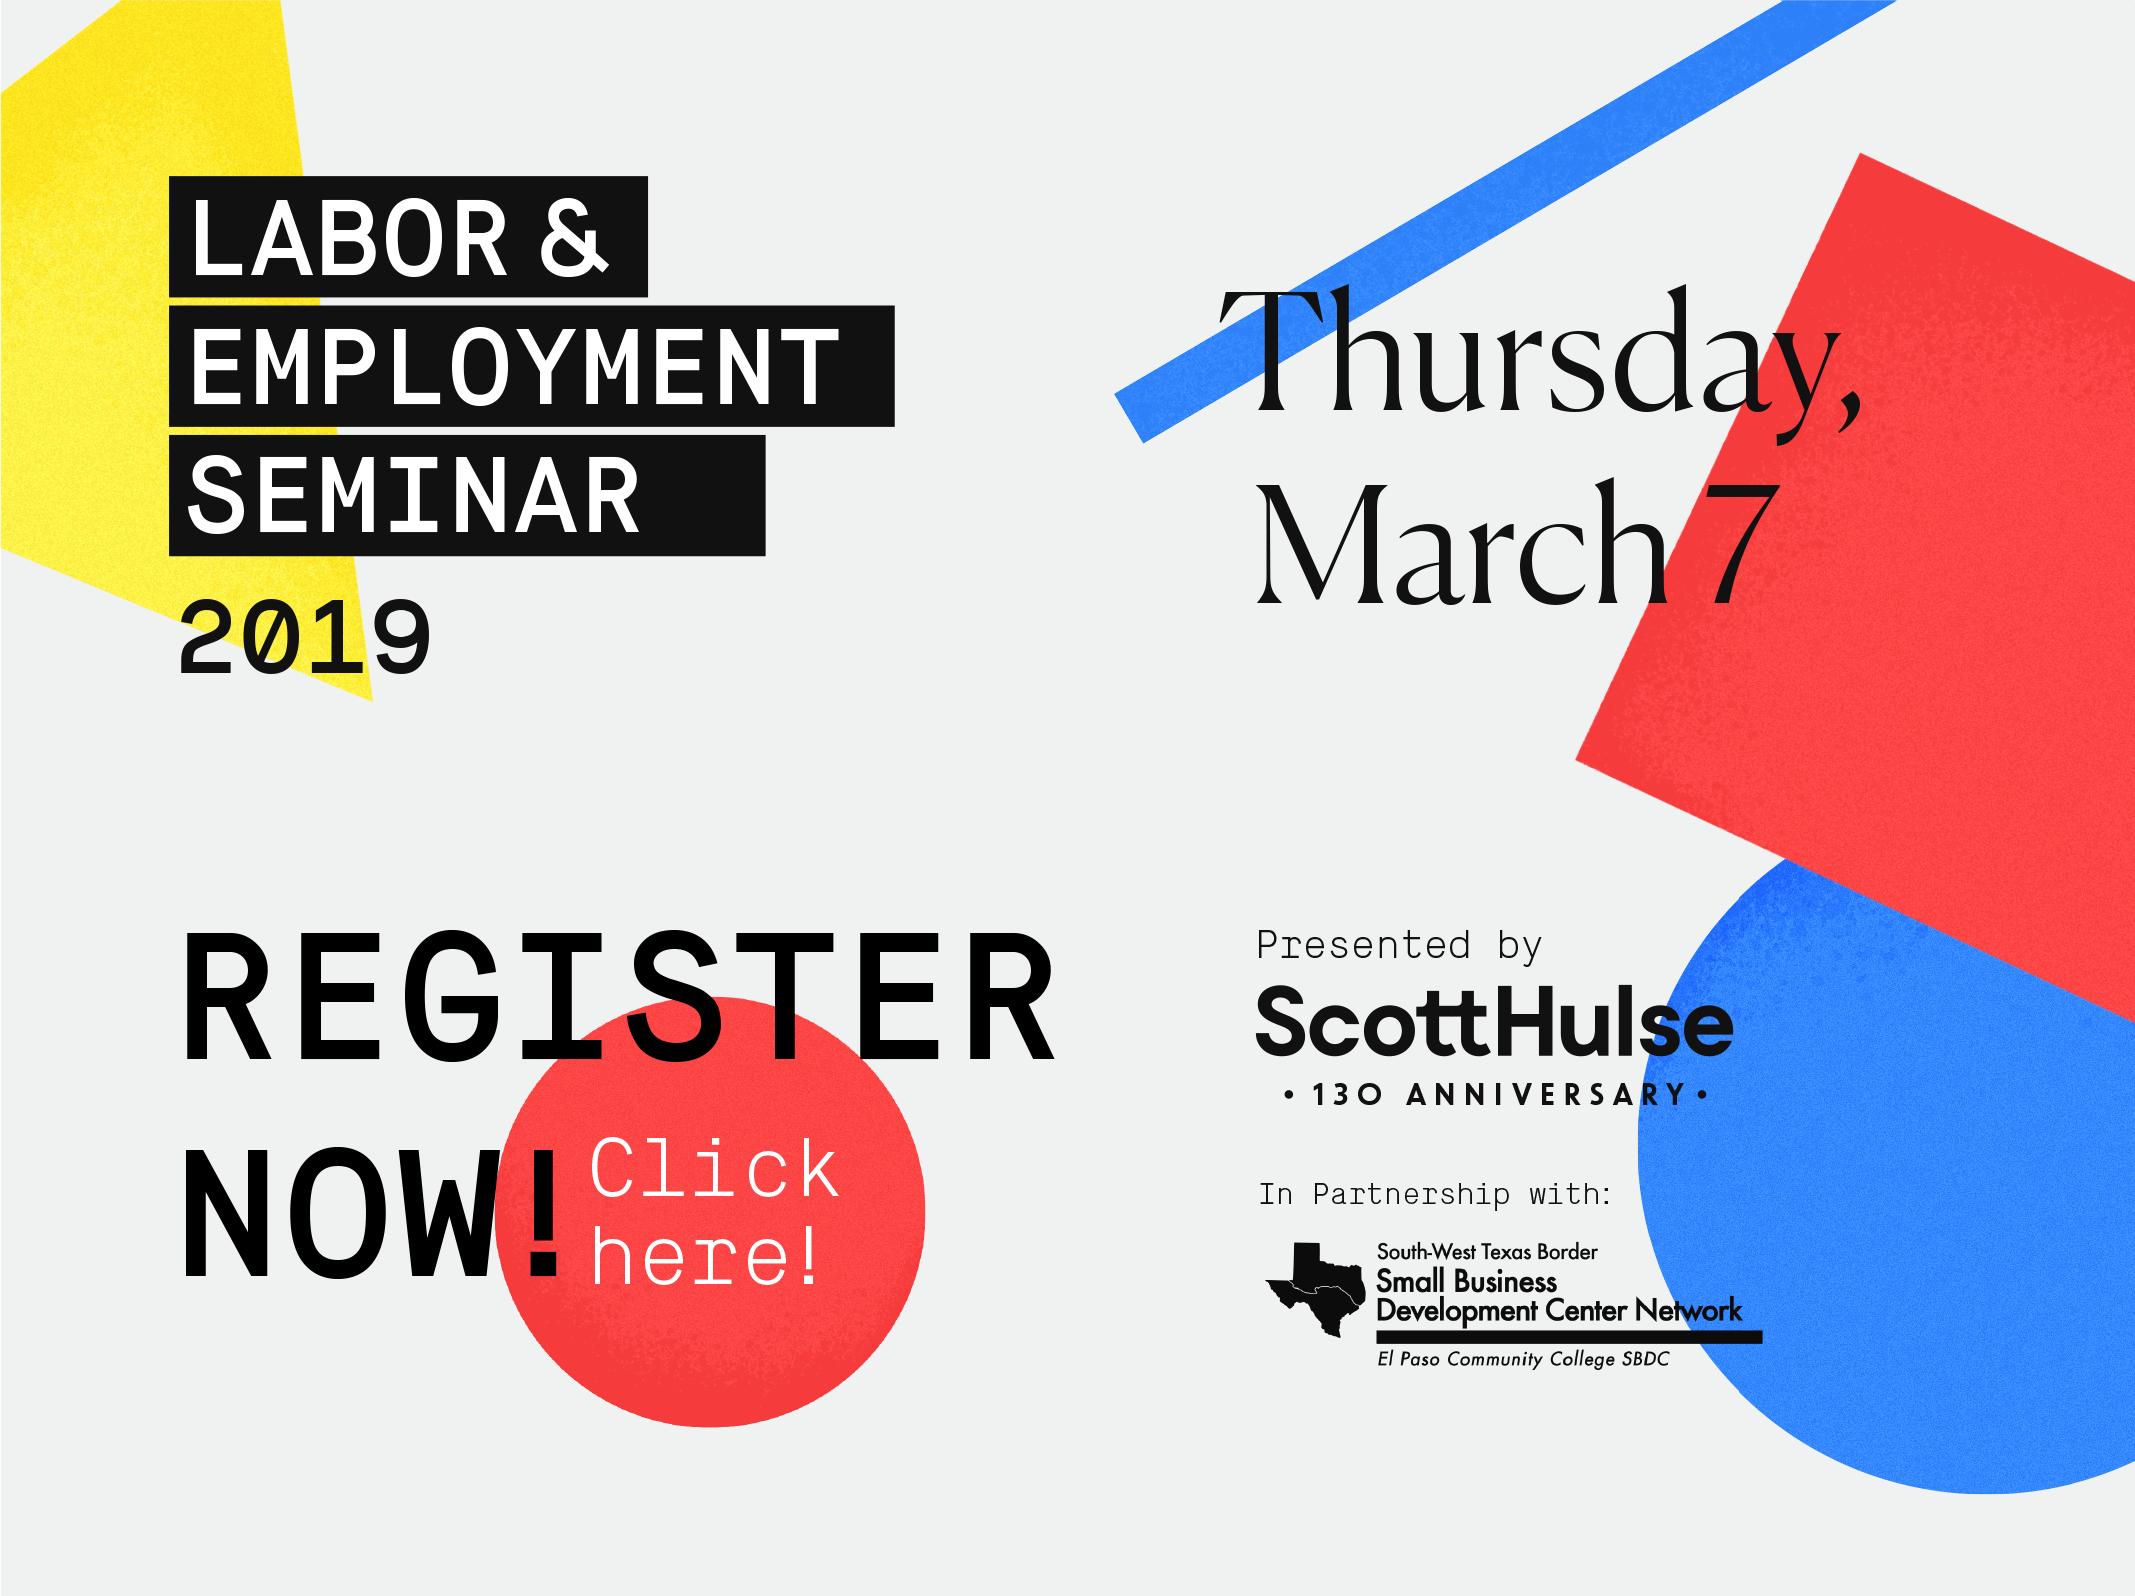 2019 Labor & Employment Seminar